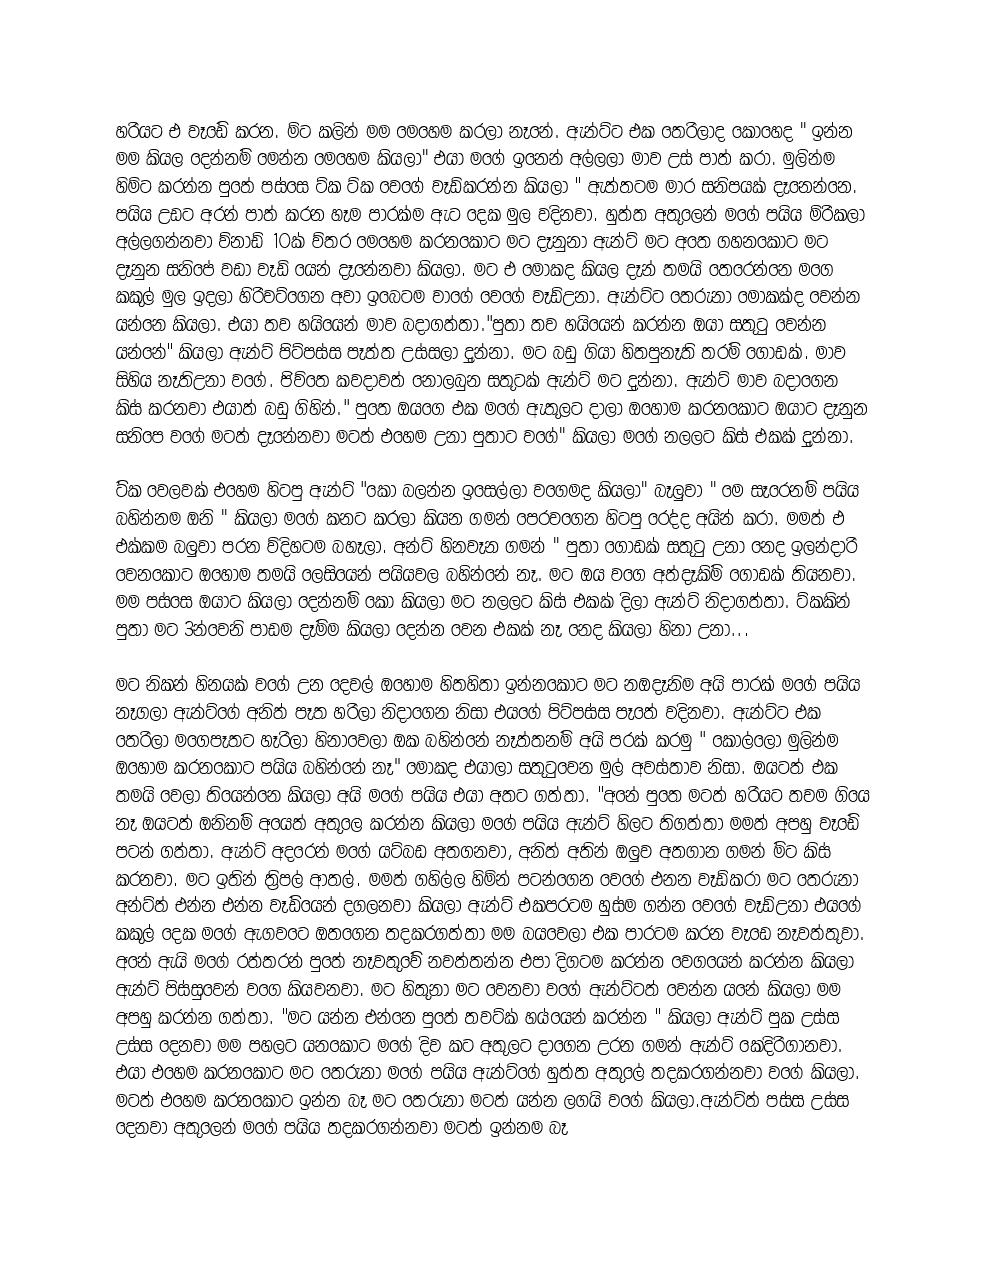 Free Sinhala Wela Katha | newhairstylesformen2014.com